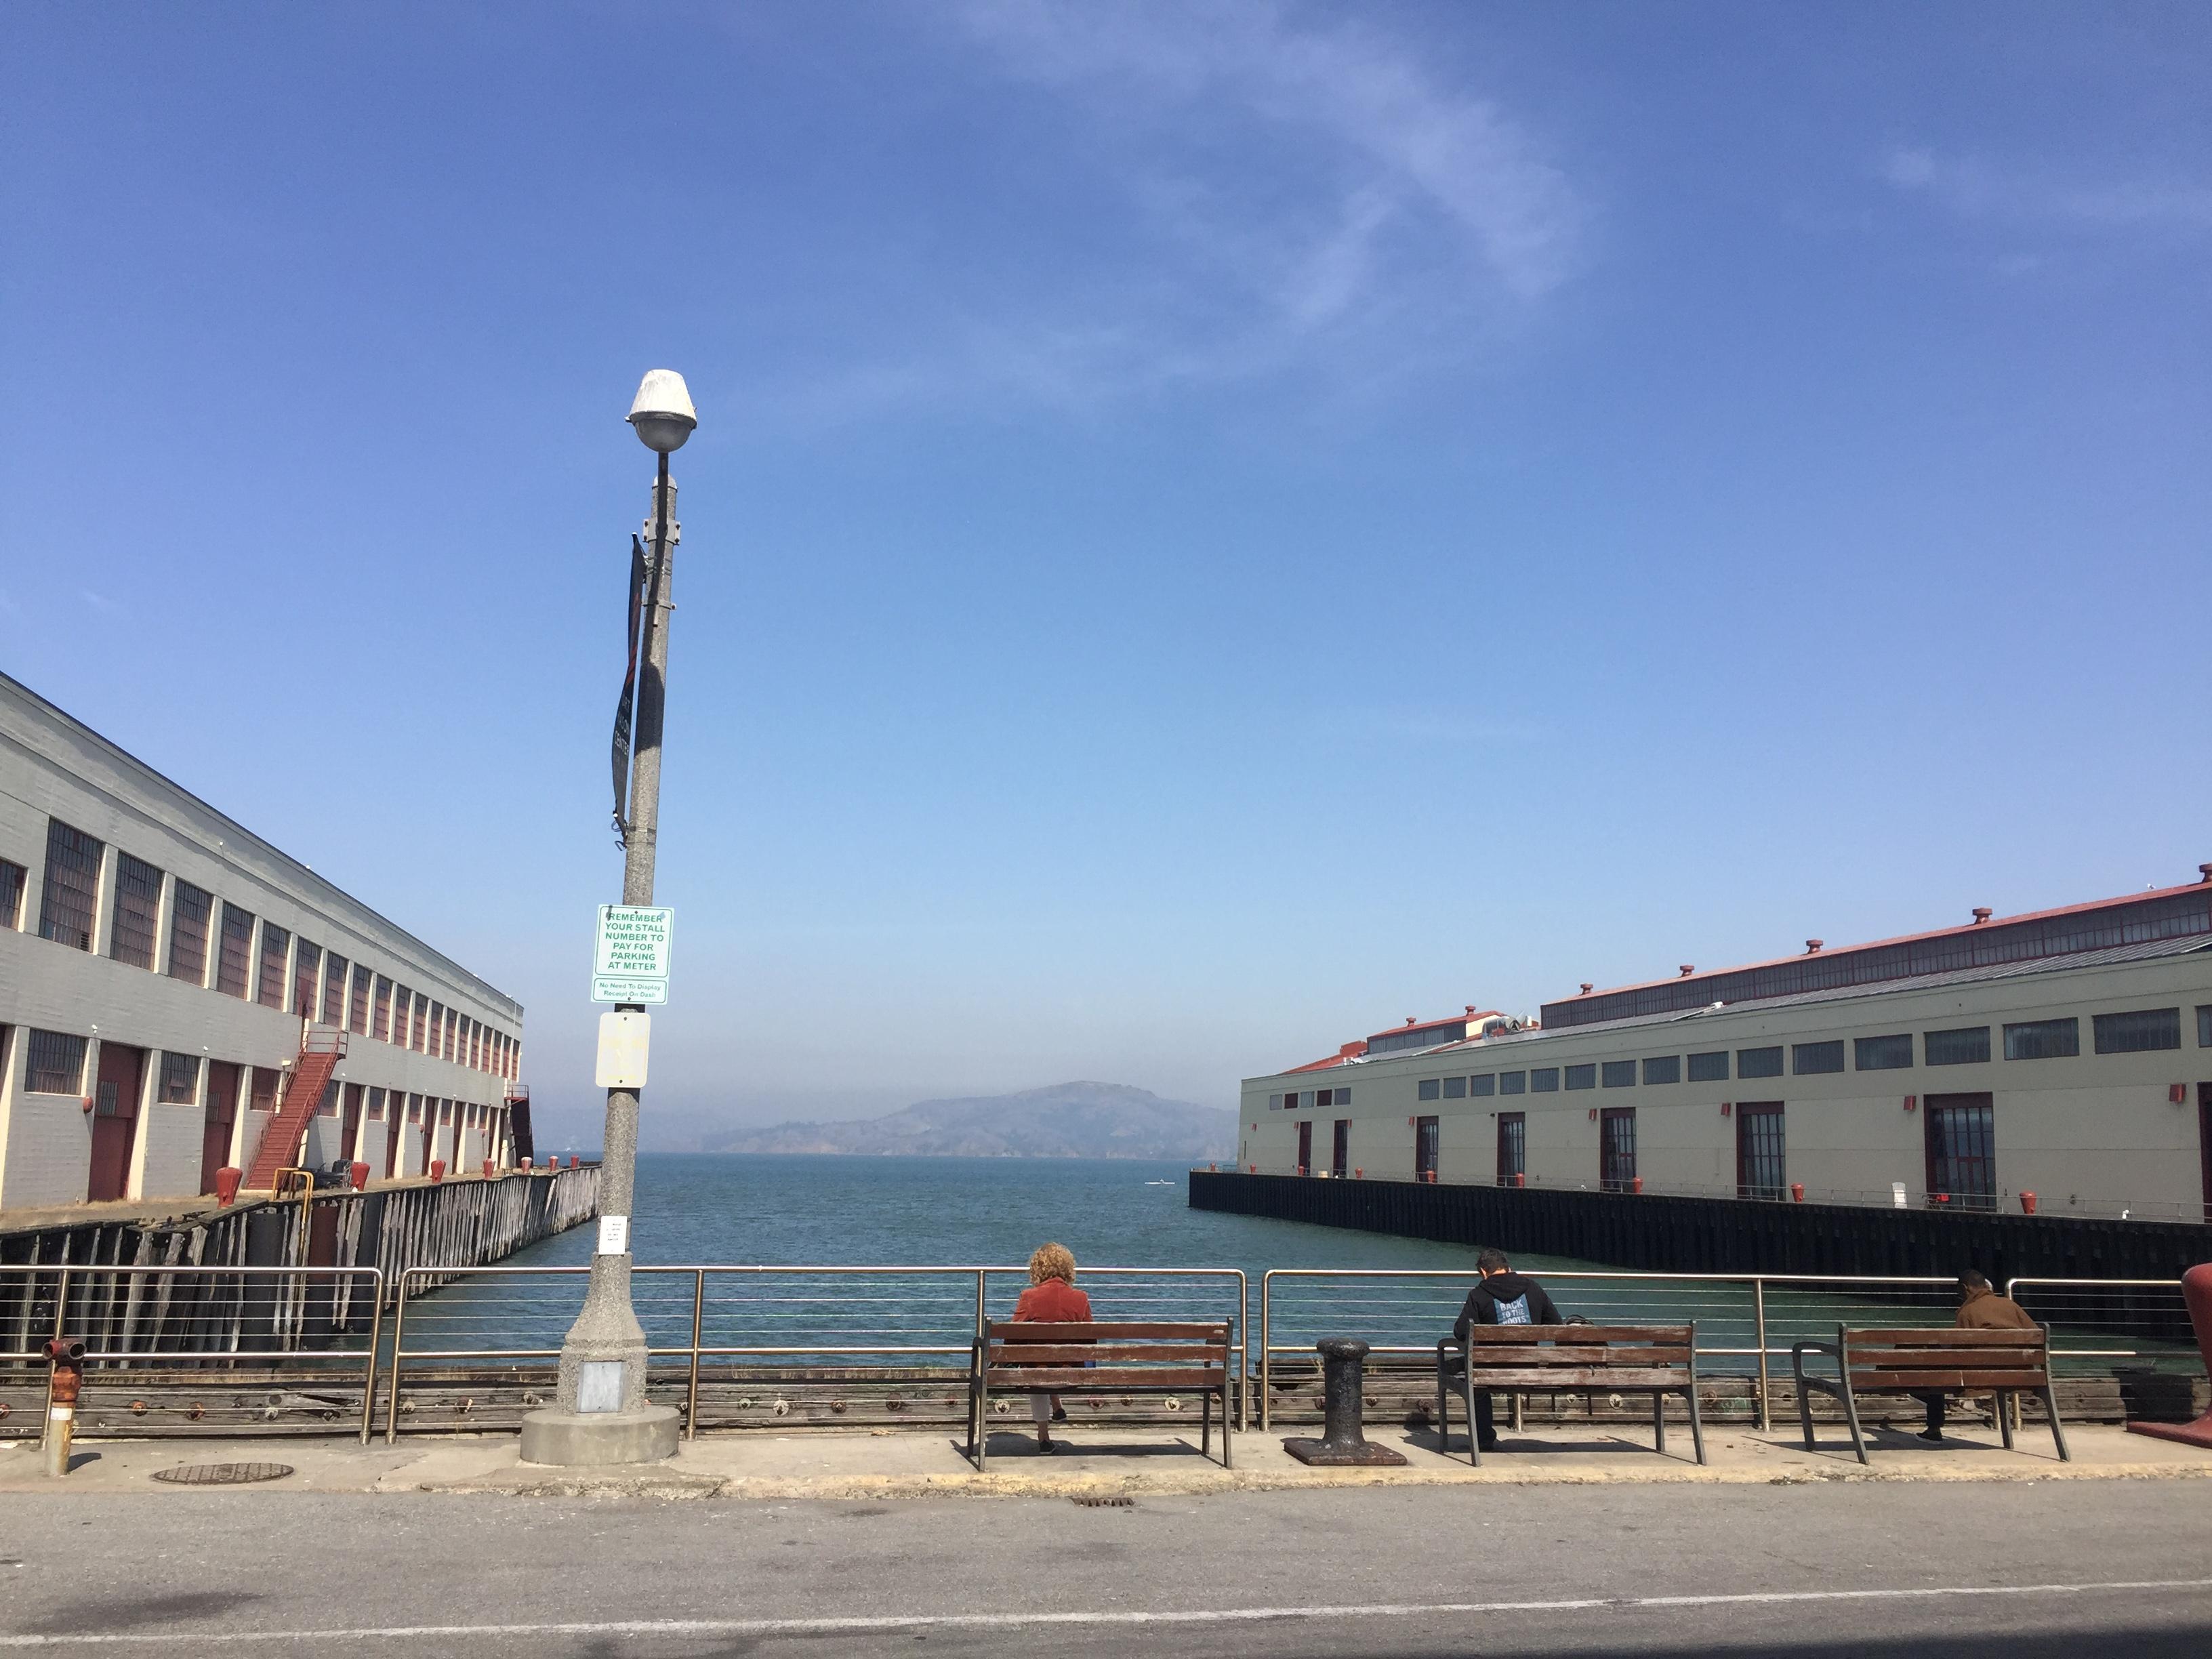 SOCAP이 열린 포트 메이슨 문화예술센터에서 본 샌프란시스코의 하늘 ©제현주